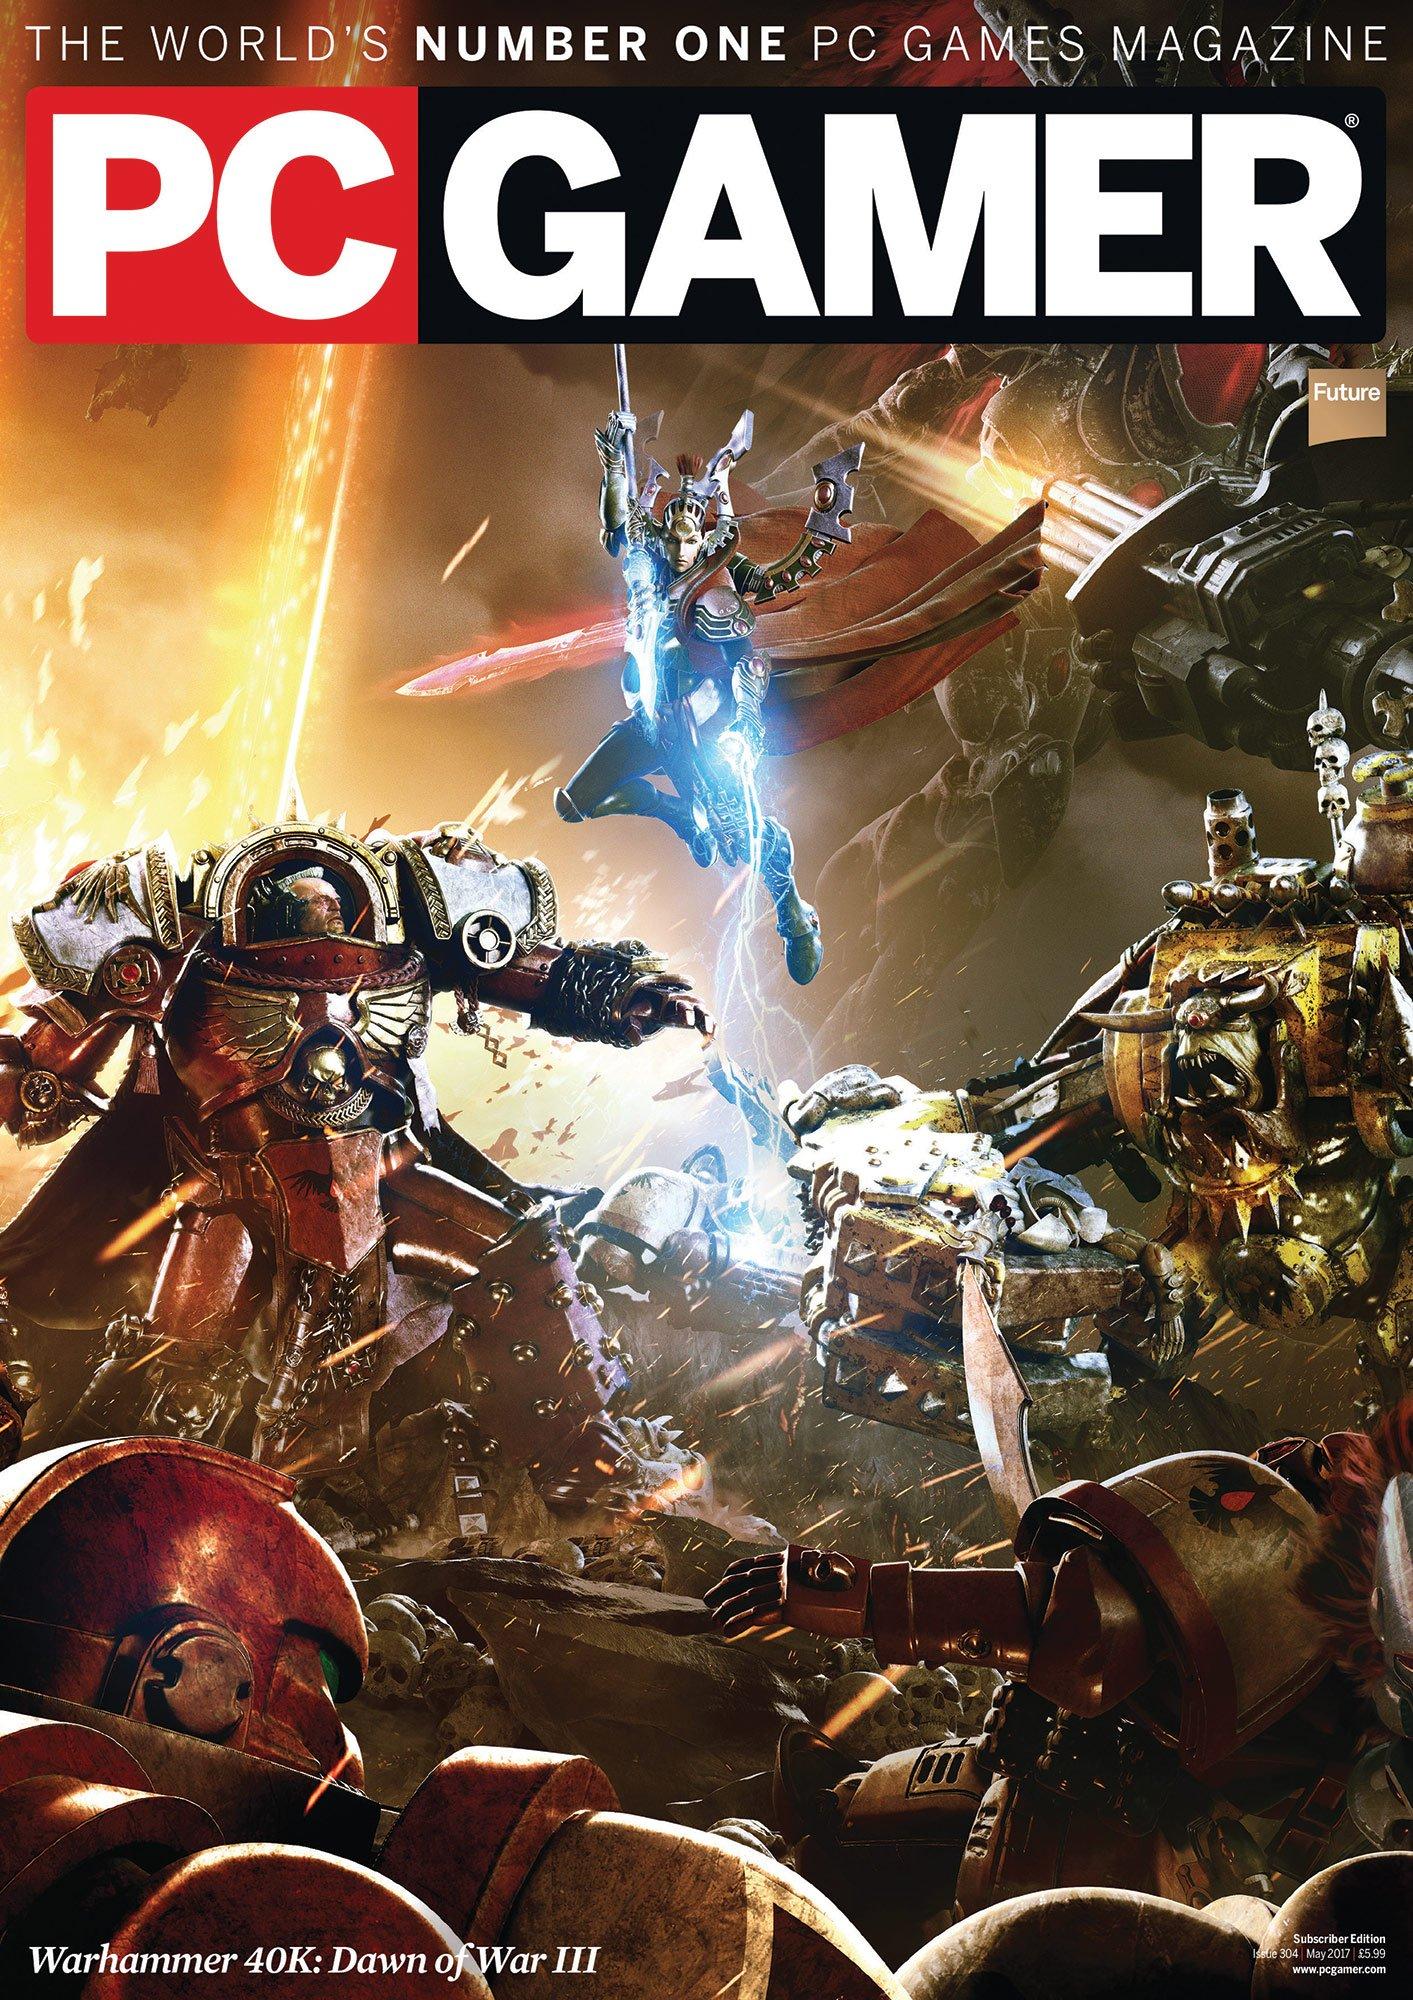 PC Gamer UK 304 May 2017 (subscriber edition)